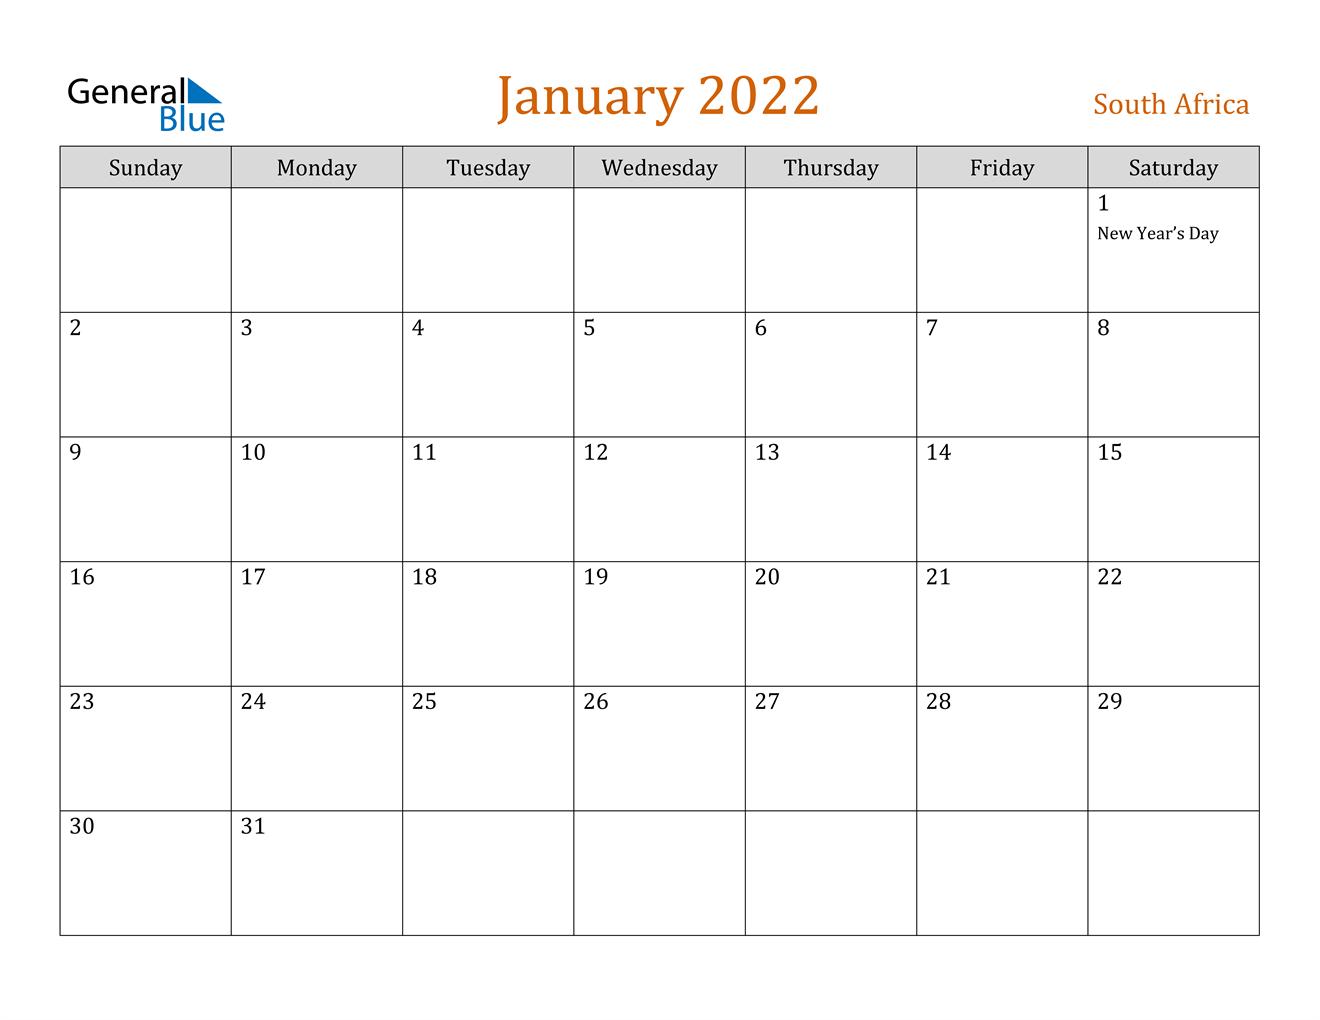 January 2022 Calendar – South Africa For Calendar Of January 2022